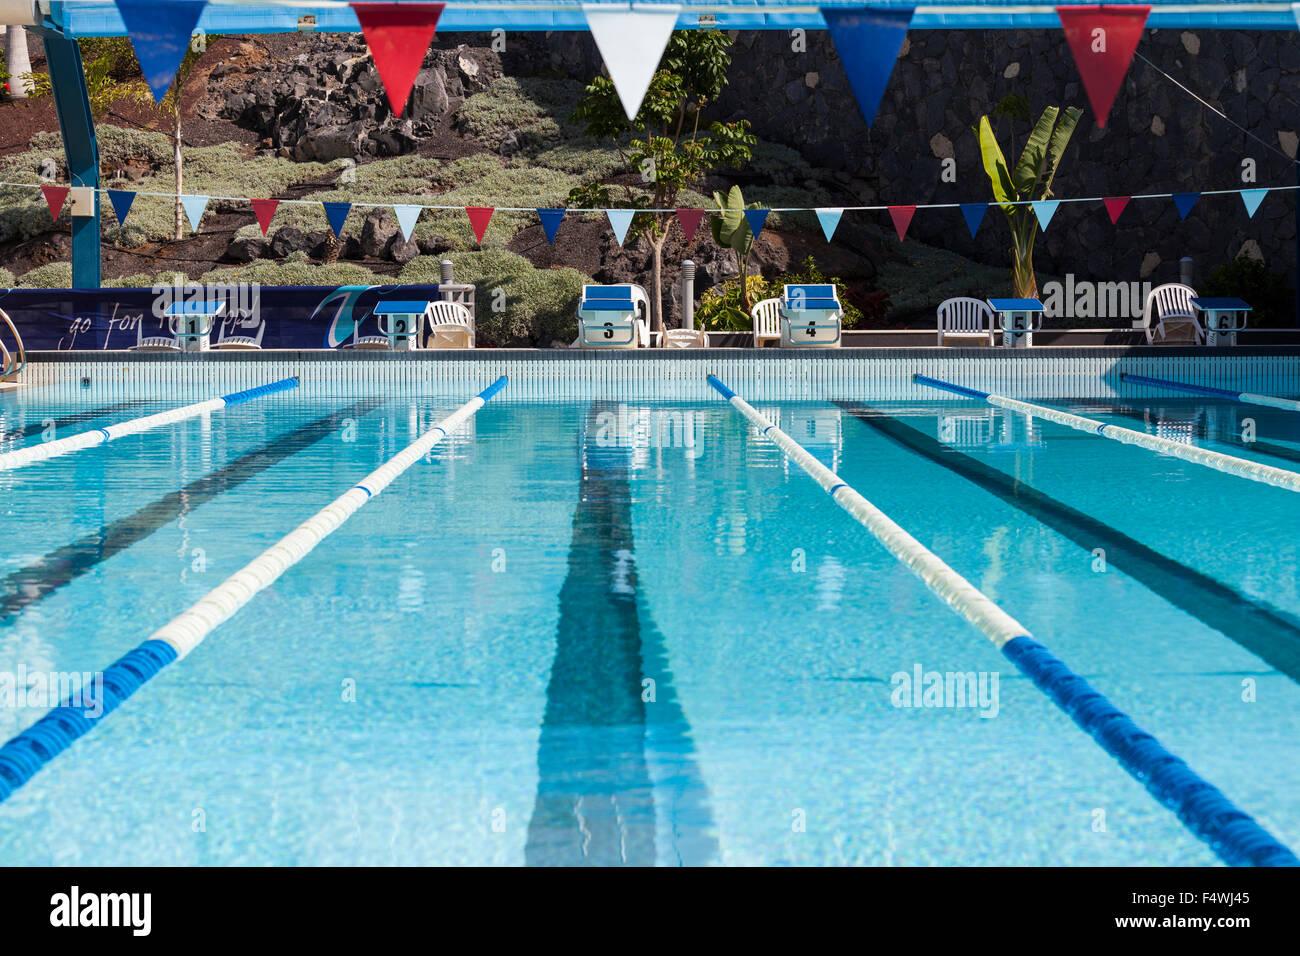 Olympic size swimming pool Stock Photo 89073493 Alamy